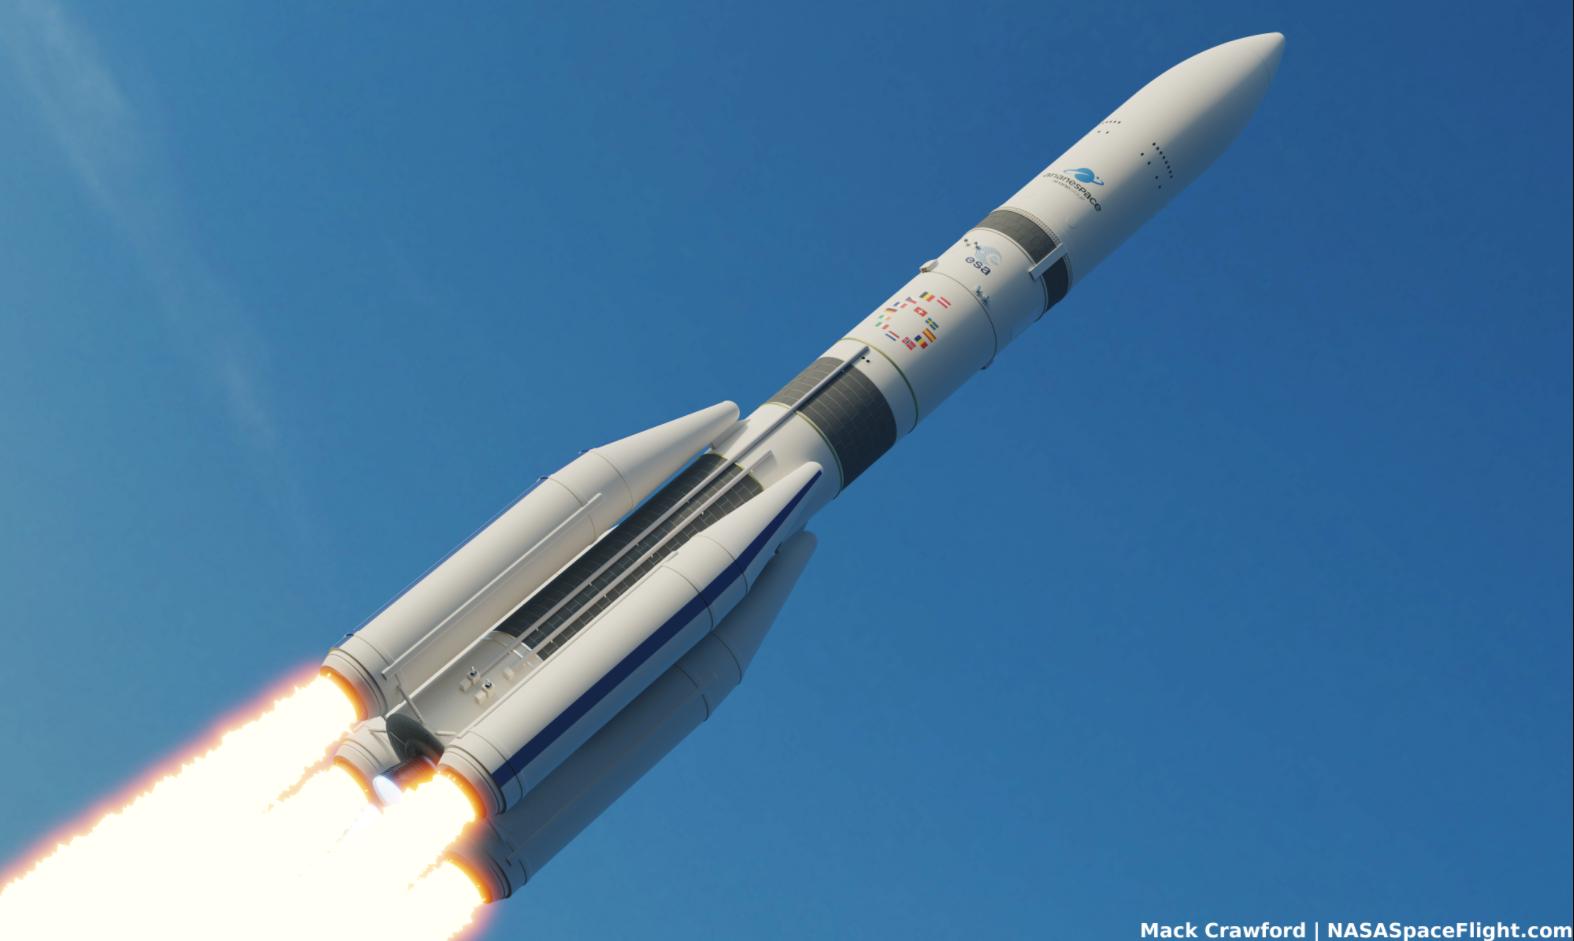 ESA roundup: Ariane 6, James Webb, & BepiColombo